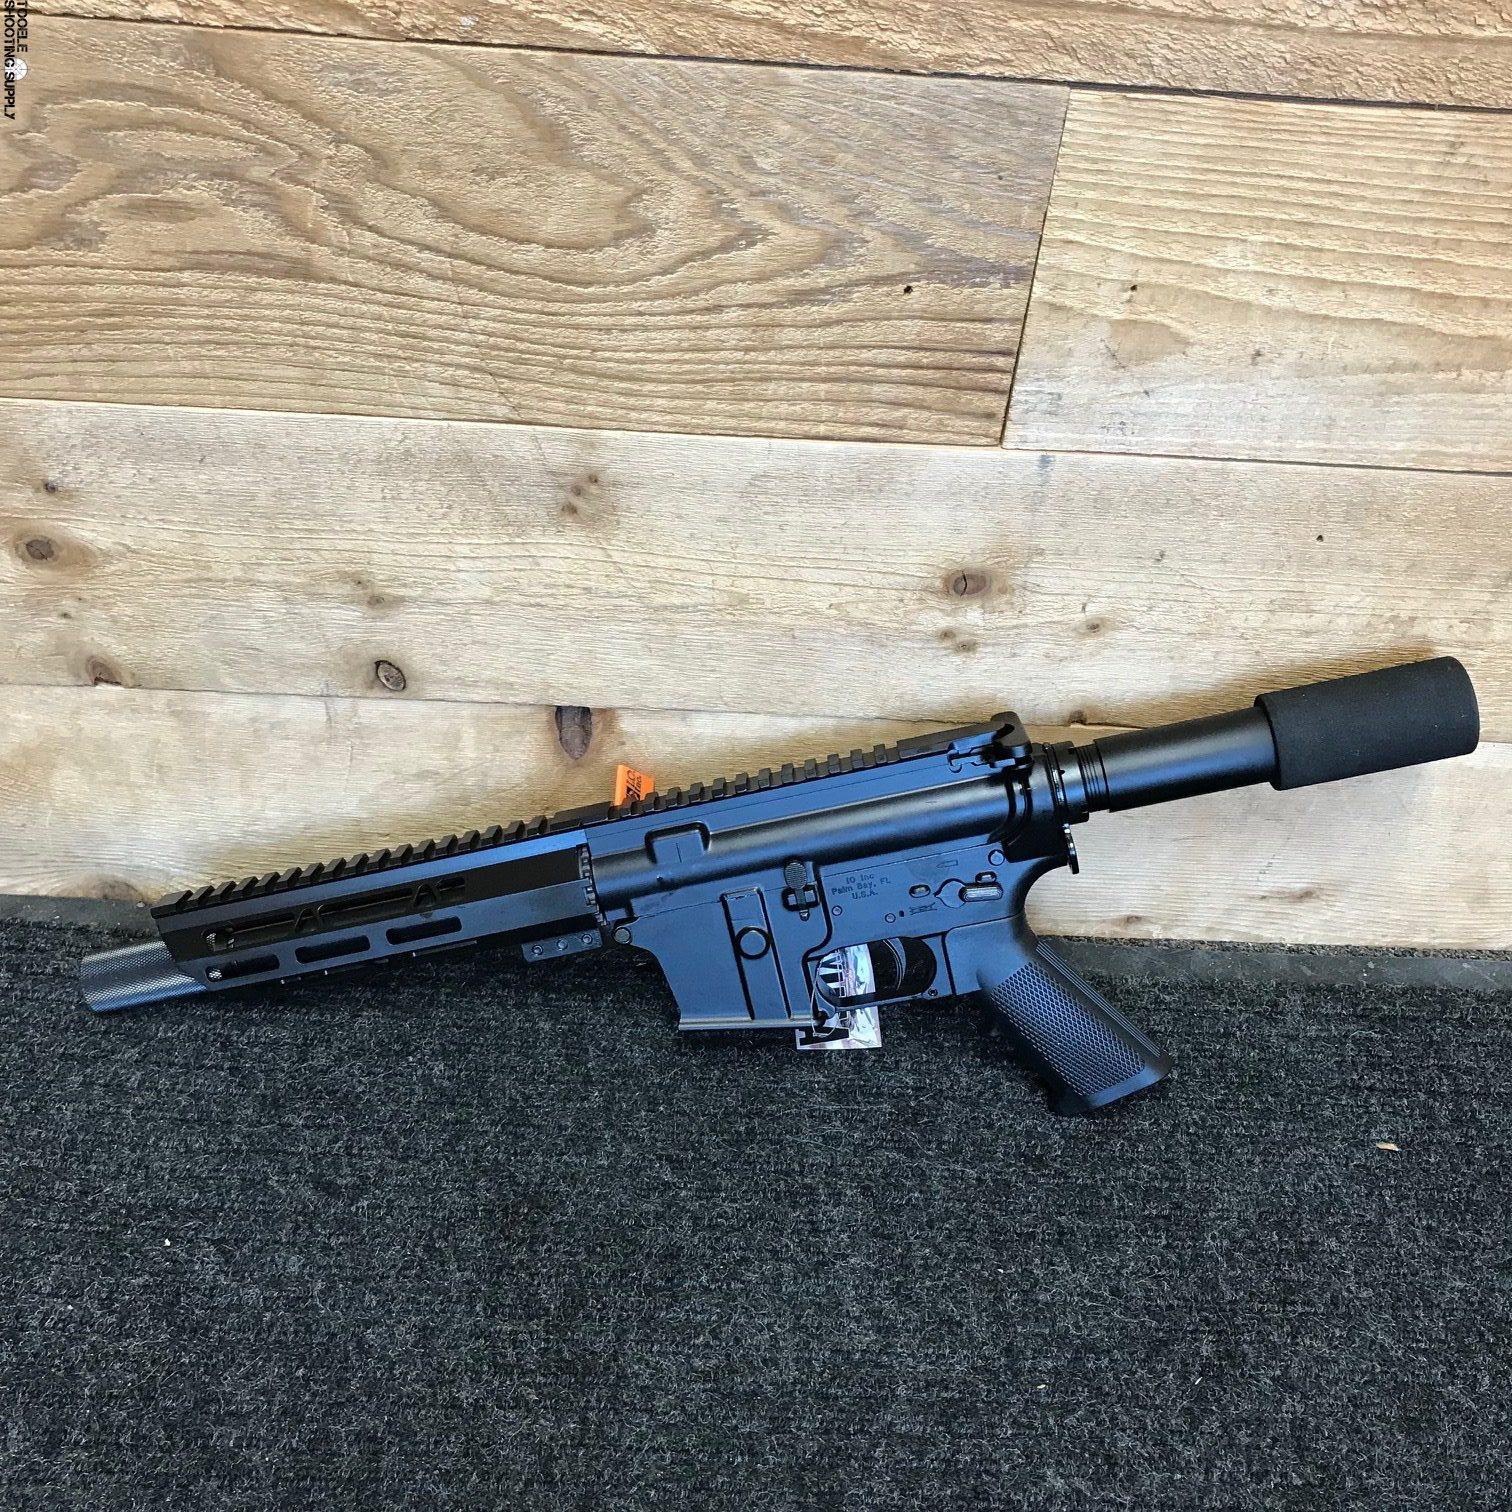 Inter Ordnance M215-ML7 AR-15 Pistol, 9mm, 9